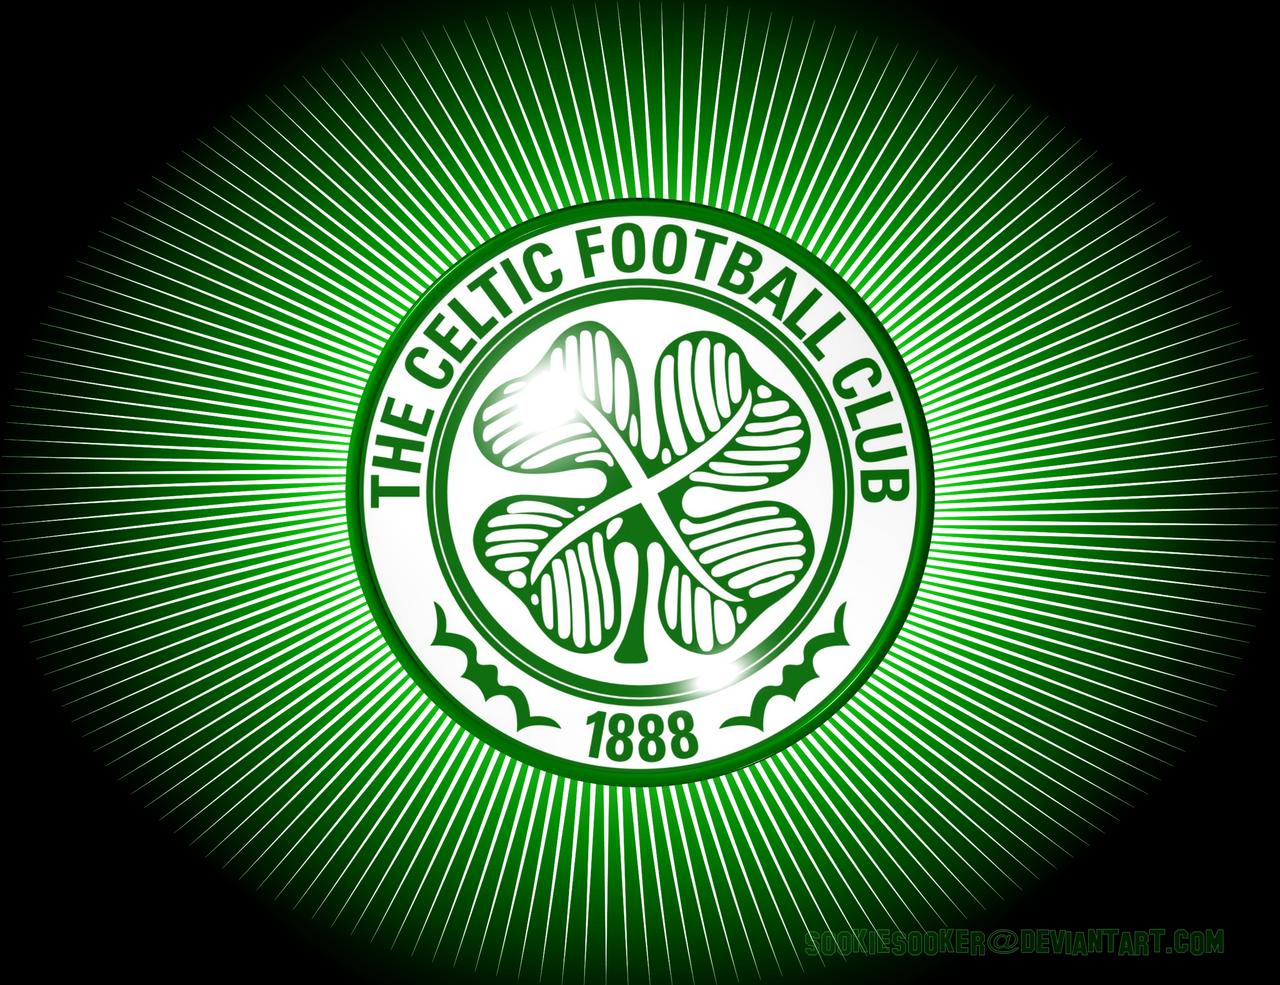 celtic fc - photo #6